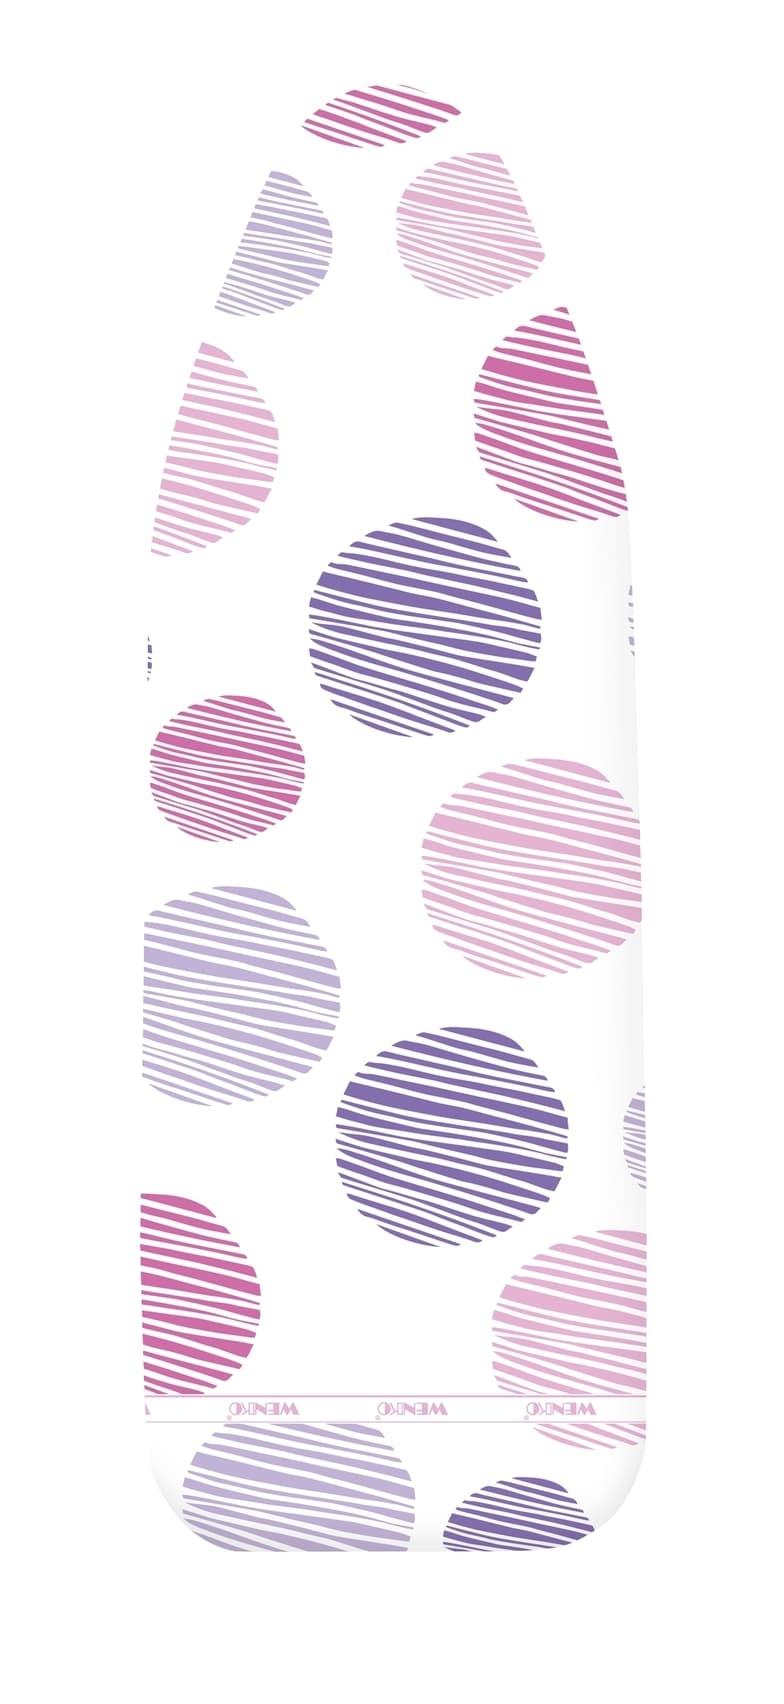 Husa masa de calcat din bumbac, Basic Pro M/L, Multicolor, L128xl44 cm imagine